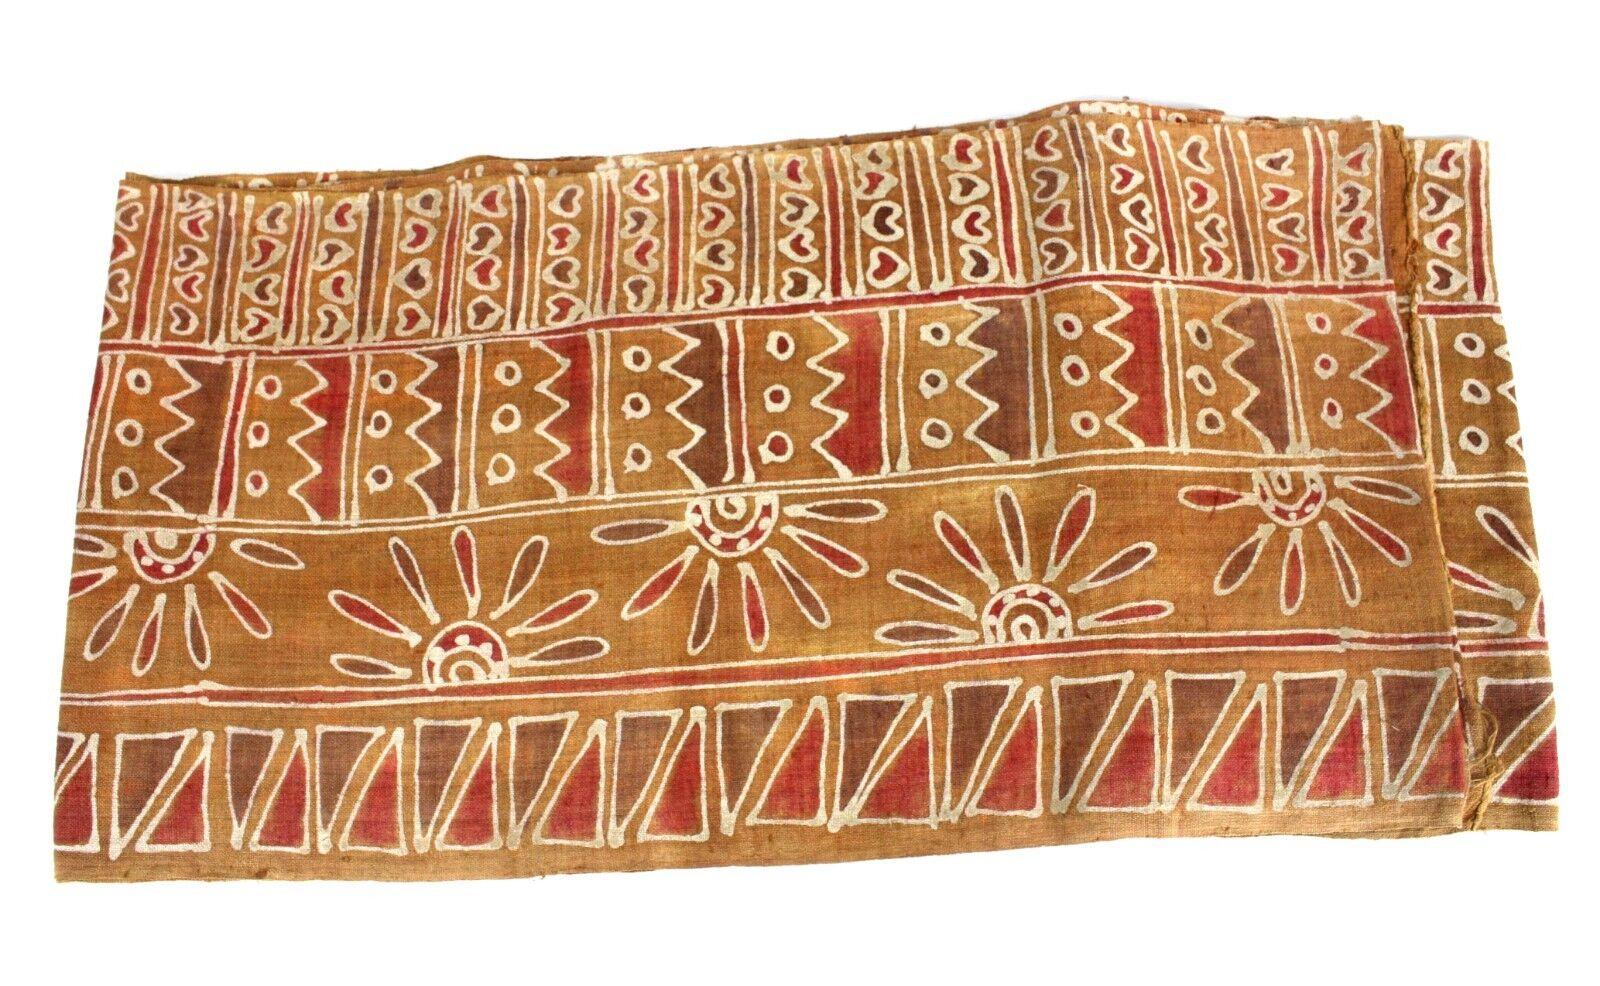 Thai linen batik fabric 545cm x 34cm home decor, wall hanging, table runner XL